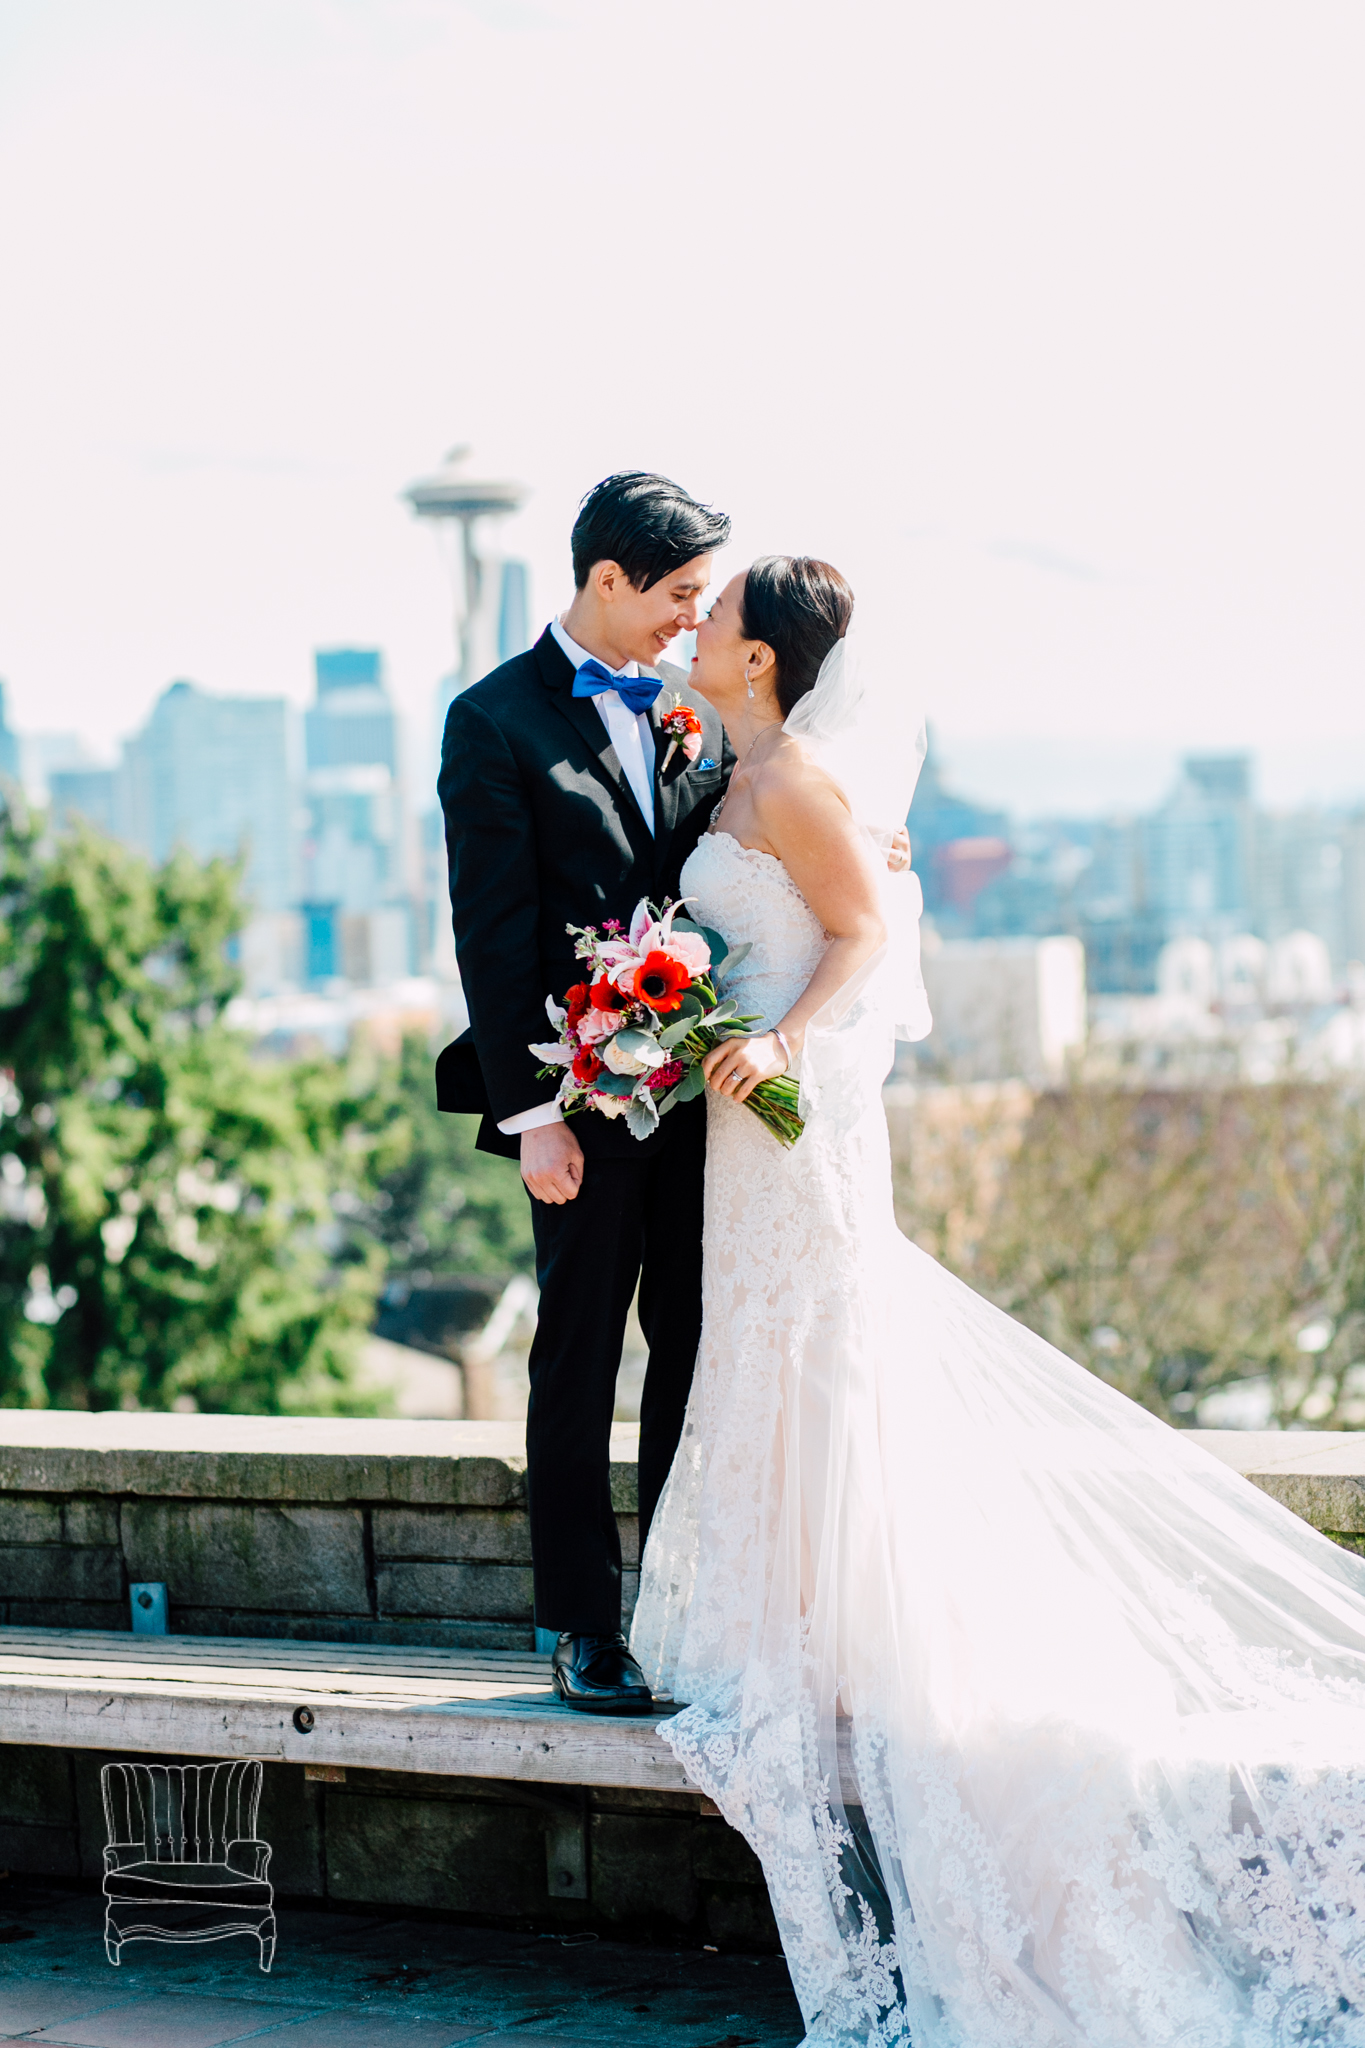 seattle-kerry-park-wedding-katheryn-moran-photography-yovithomas-1.JPG